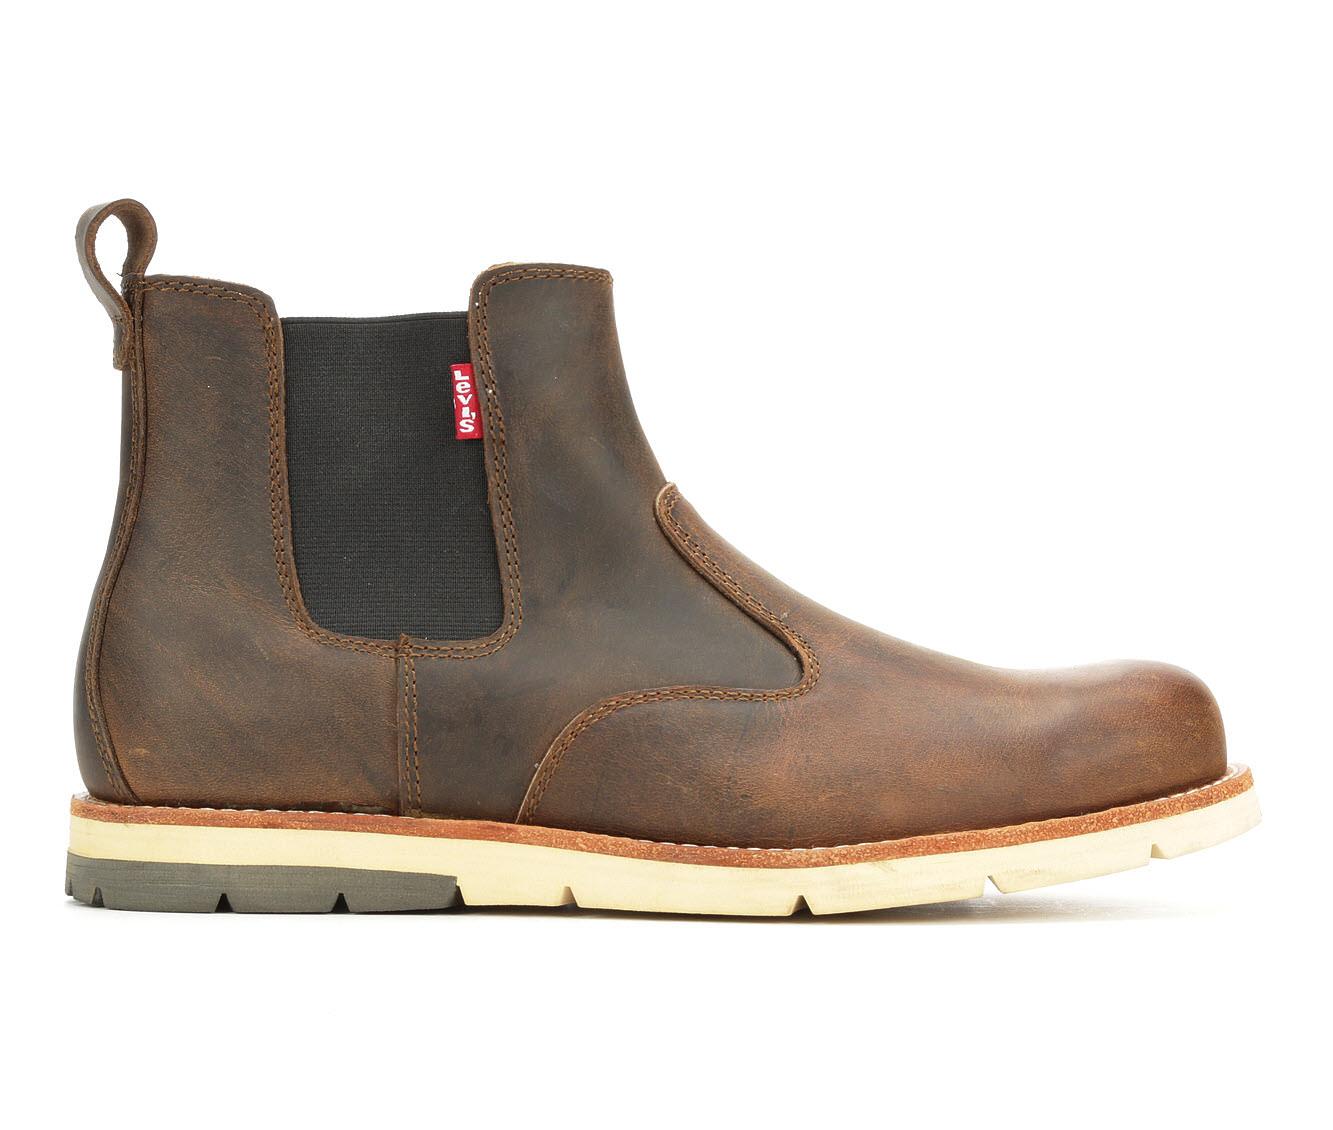 Levis Chelsea Logger Men's Boots (Brown Leather)